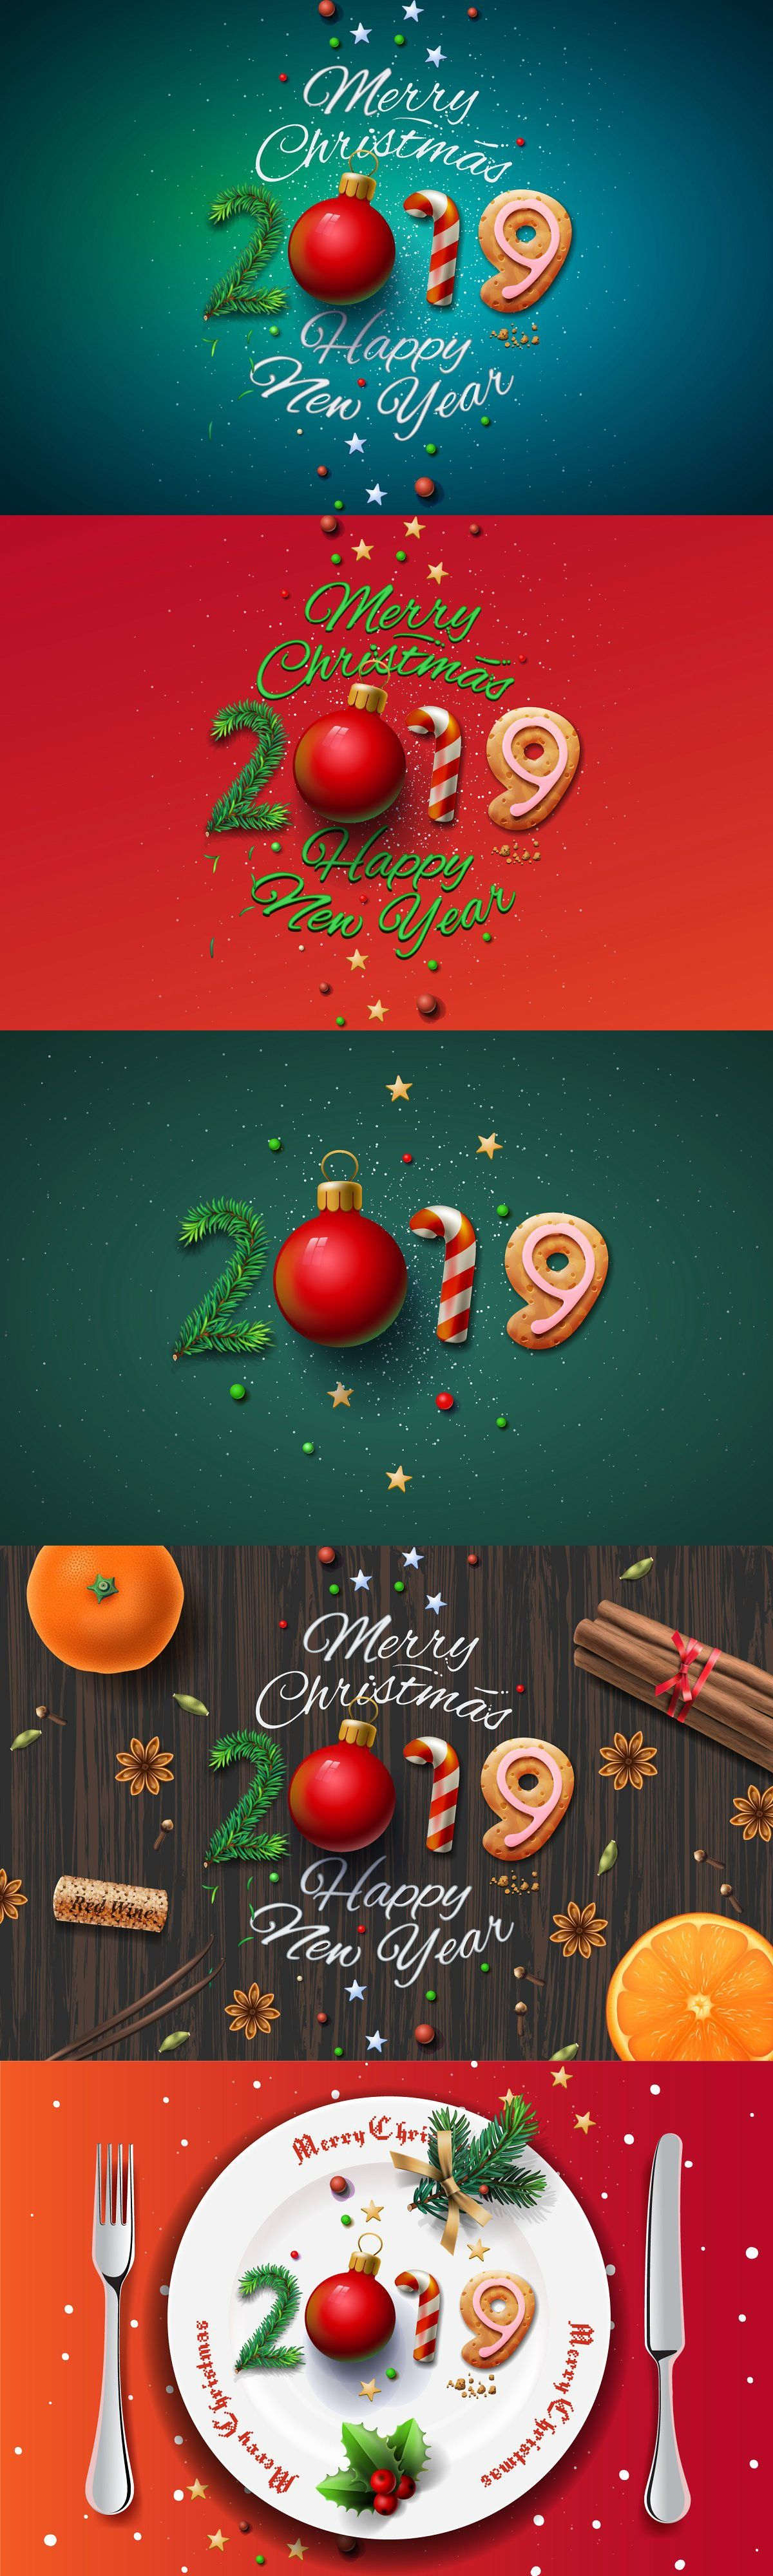 Merry Christmas Happy New Year 2019 Merry Christmas And Happy New Year Merry Happy New Year 2019